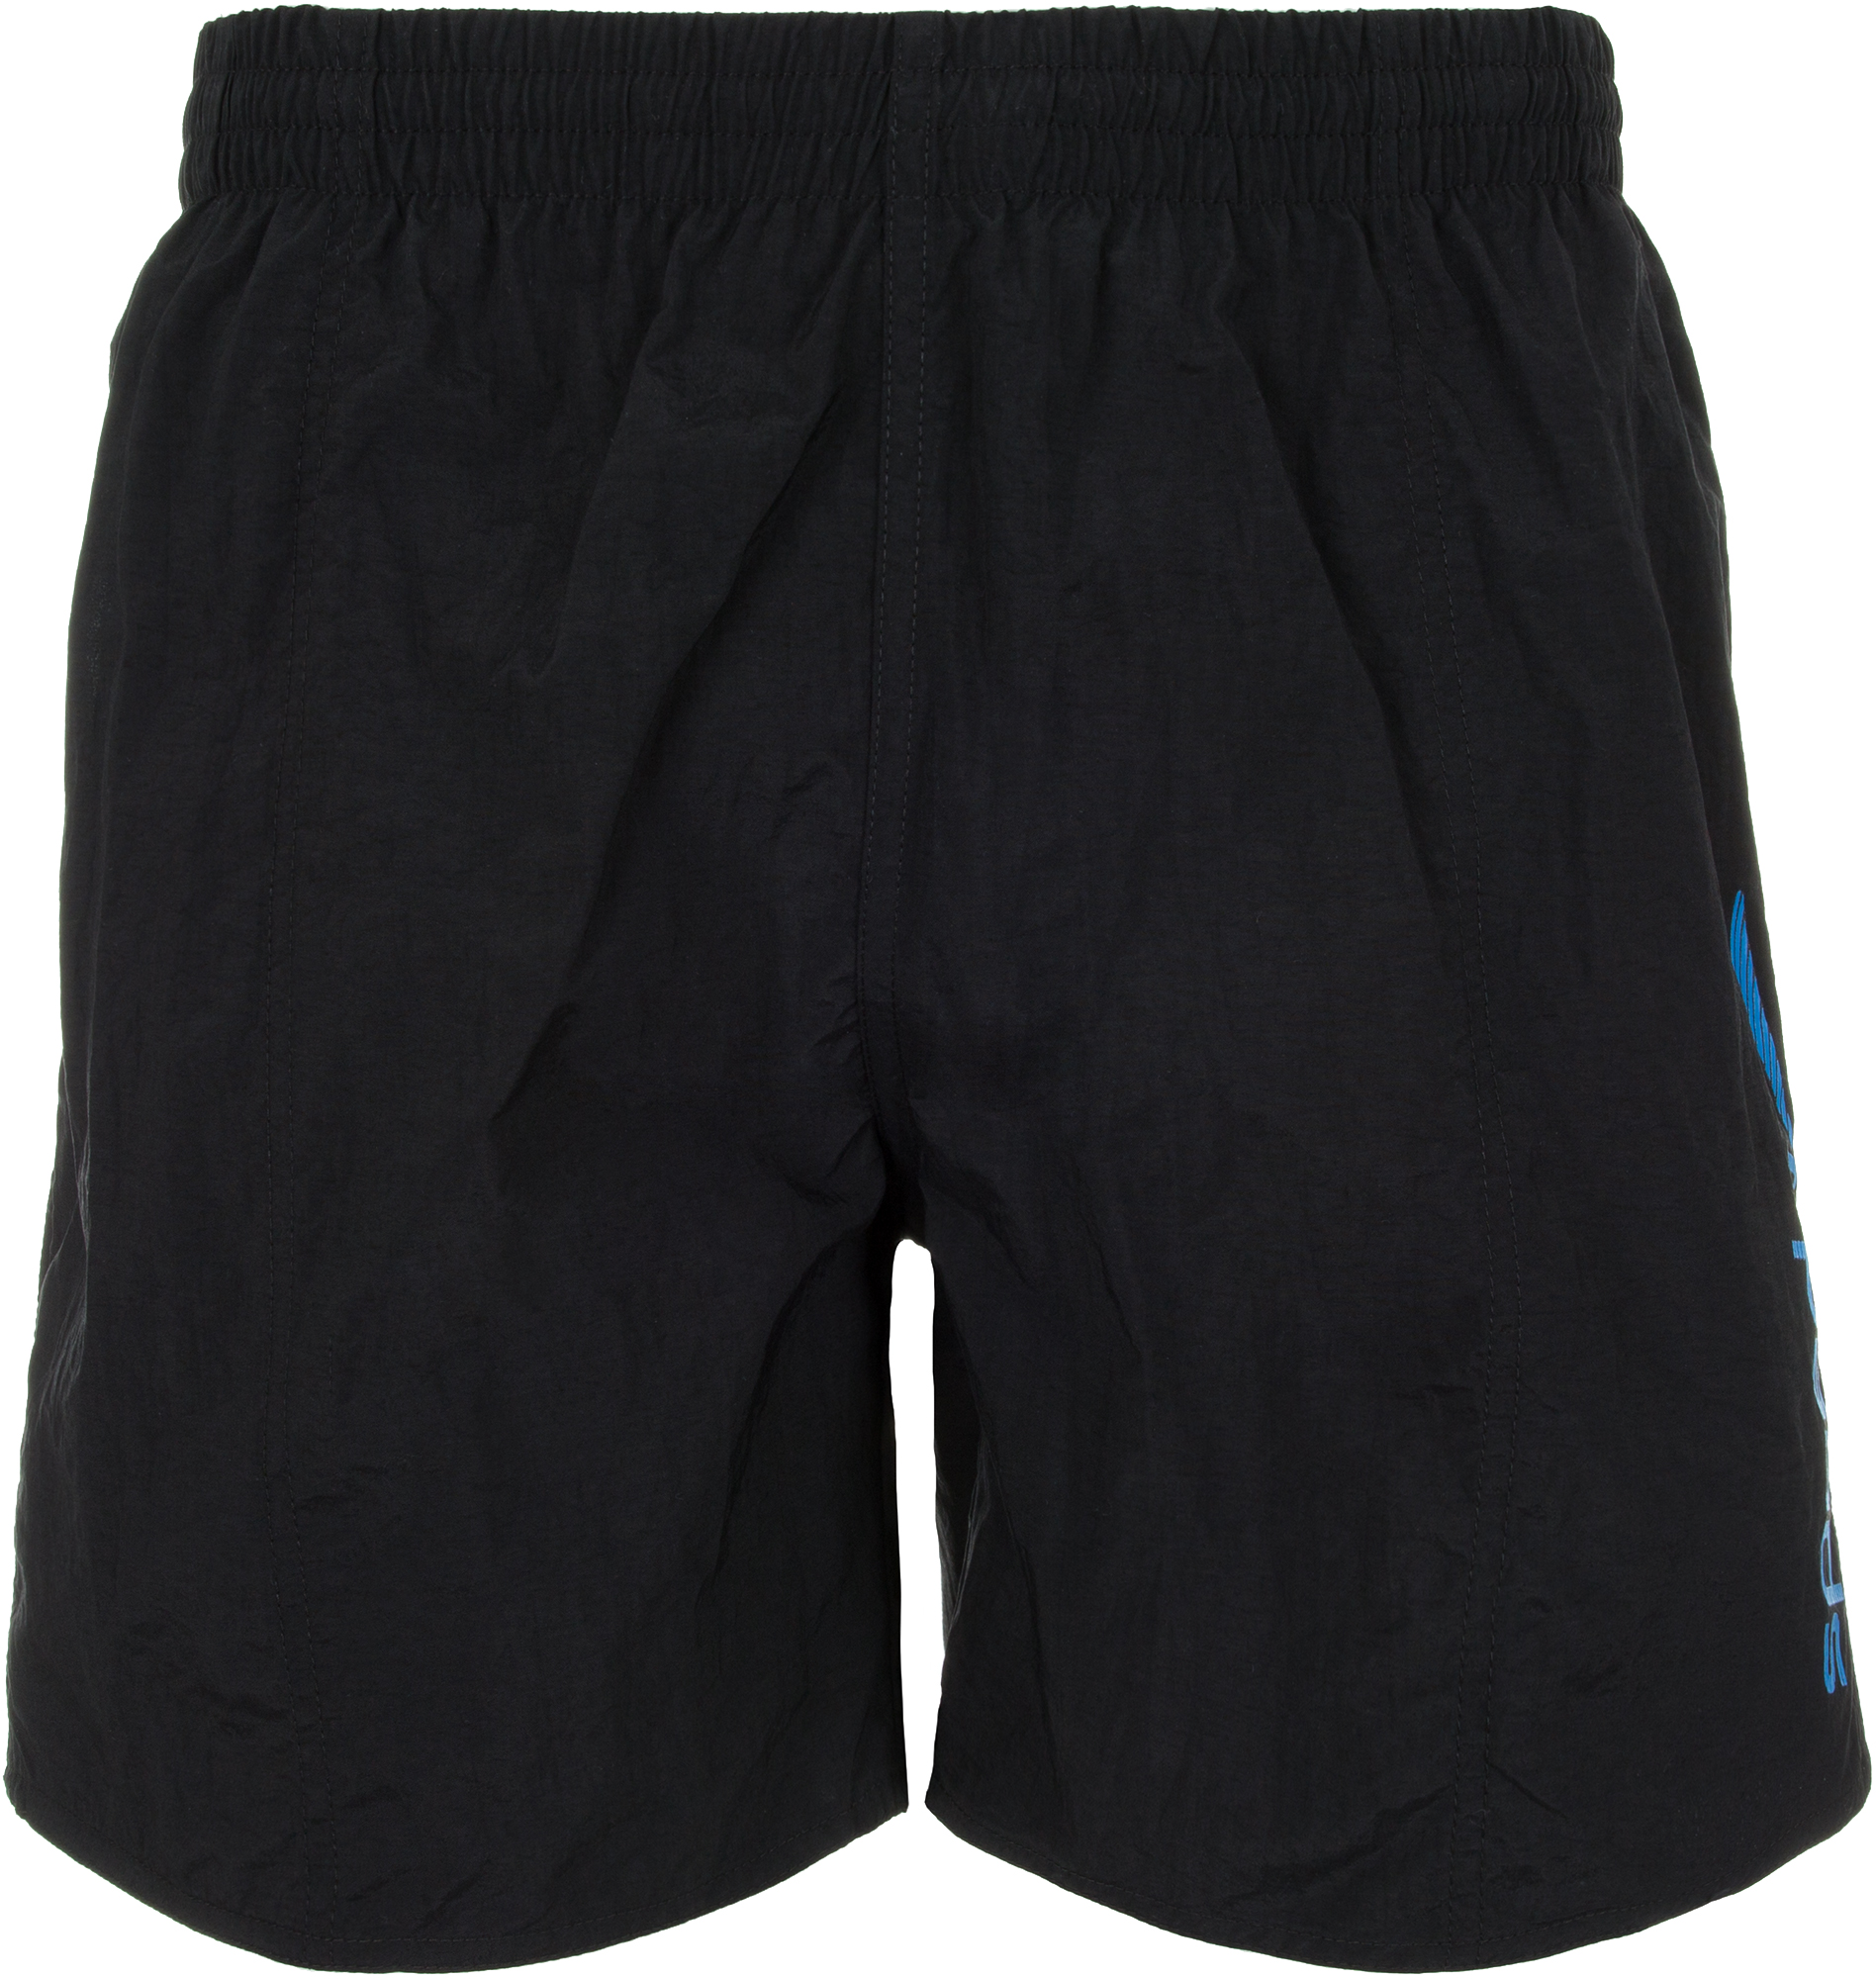 Speedo Шорты плавательные мужские Speedo Scope 16, размер 54-56 speedo плавки шорты мужские speedo essential classic размер 48 50